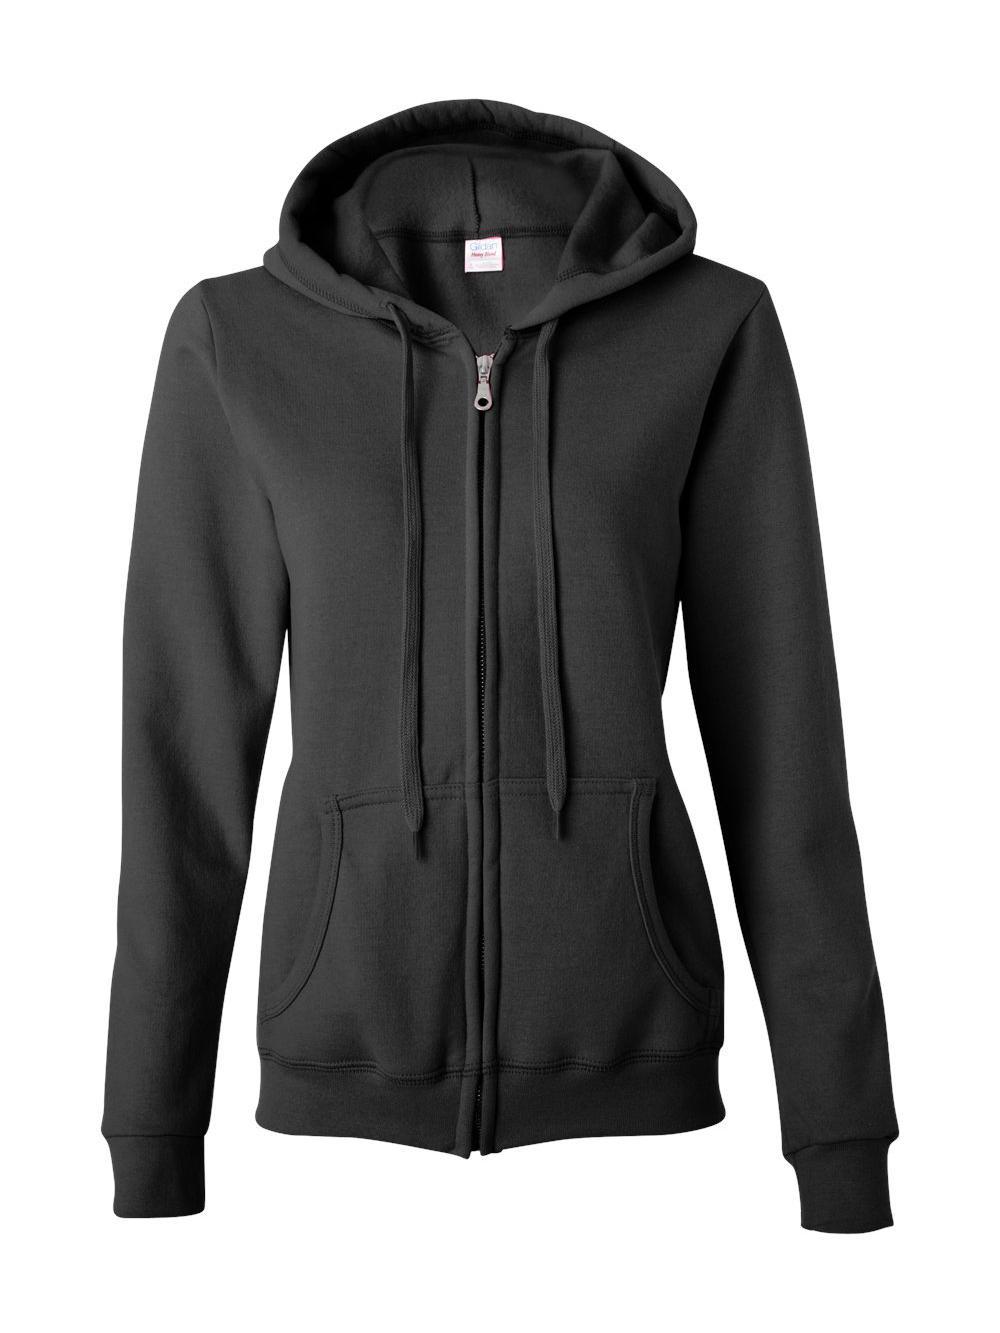 Gildan-Heavy-Blend-Women-039-s-Full-Zip-Hooded-Sweatshirt-18600FL thumbnail 6